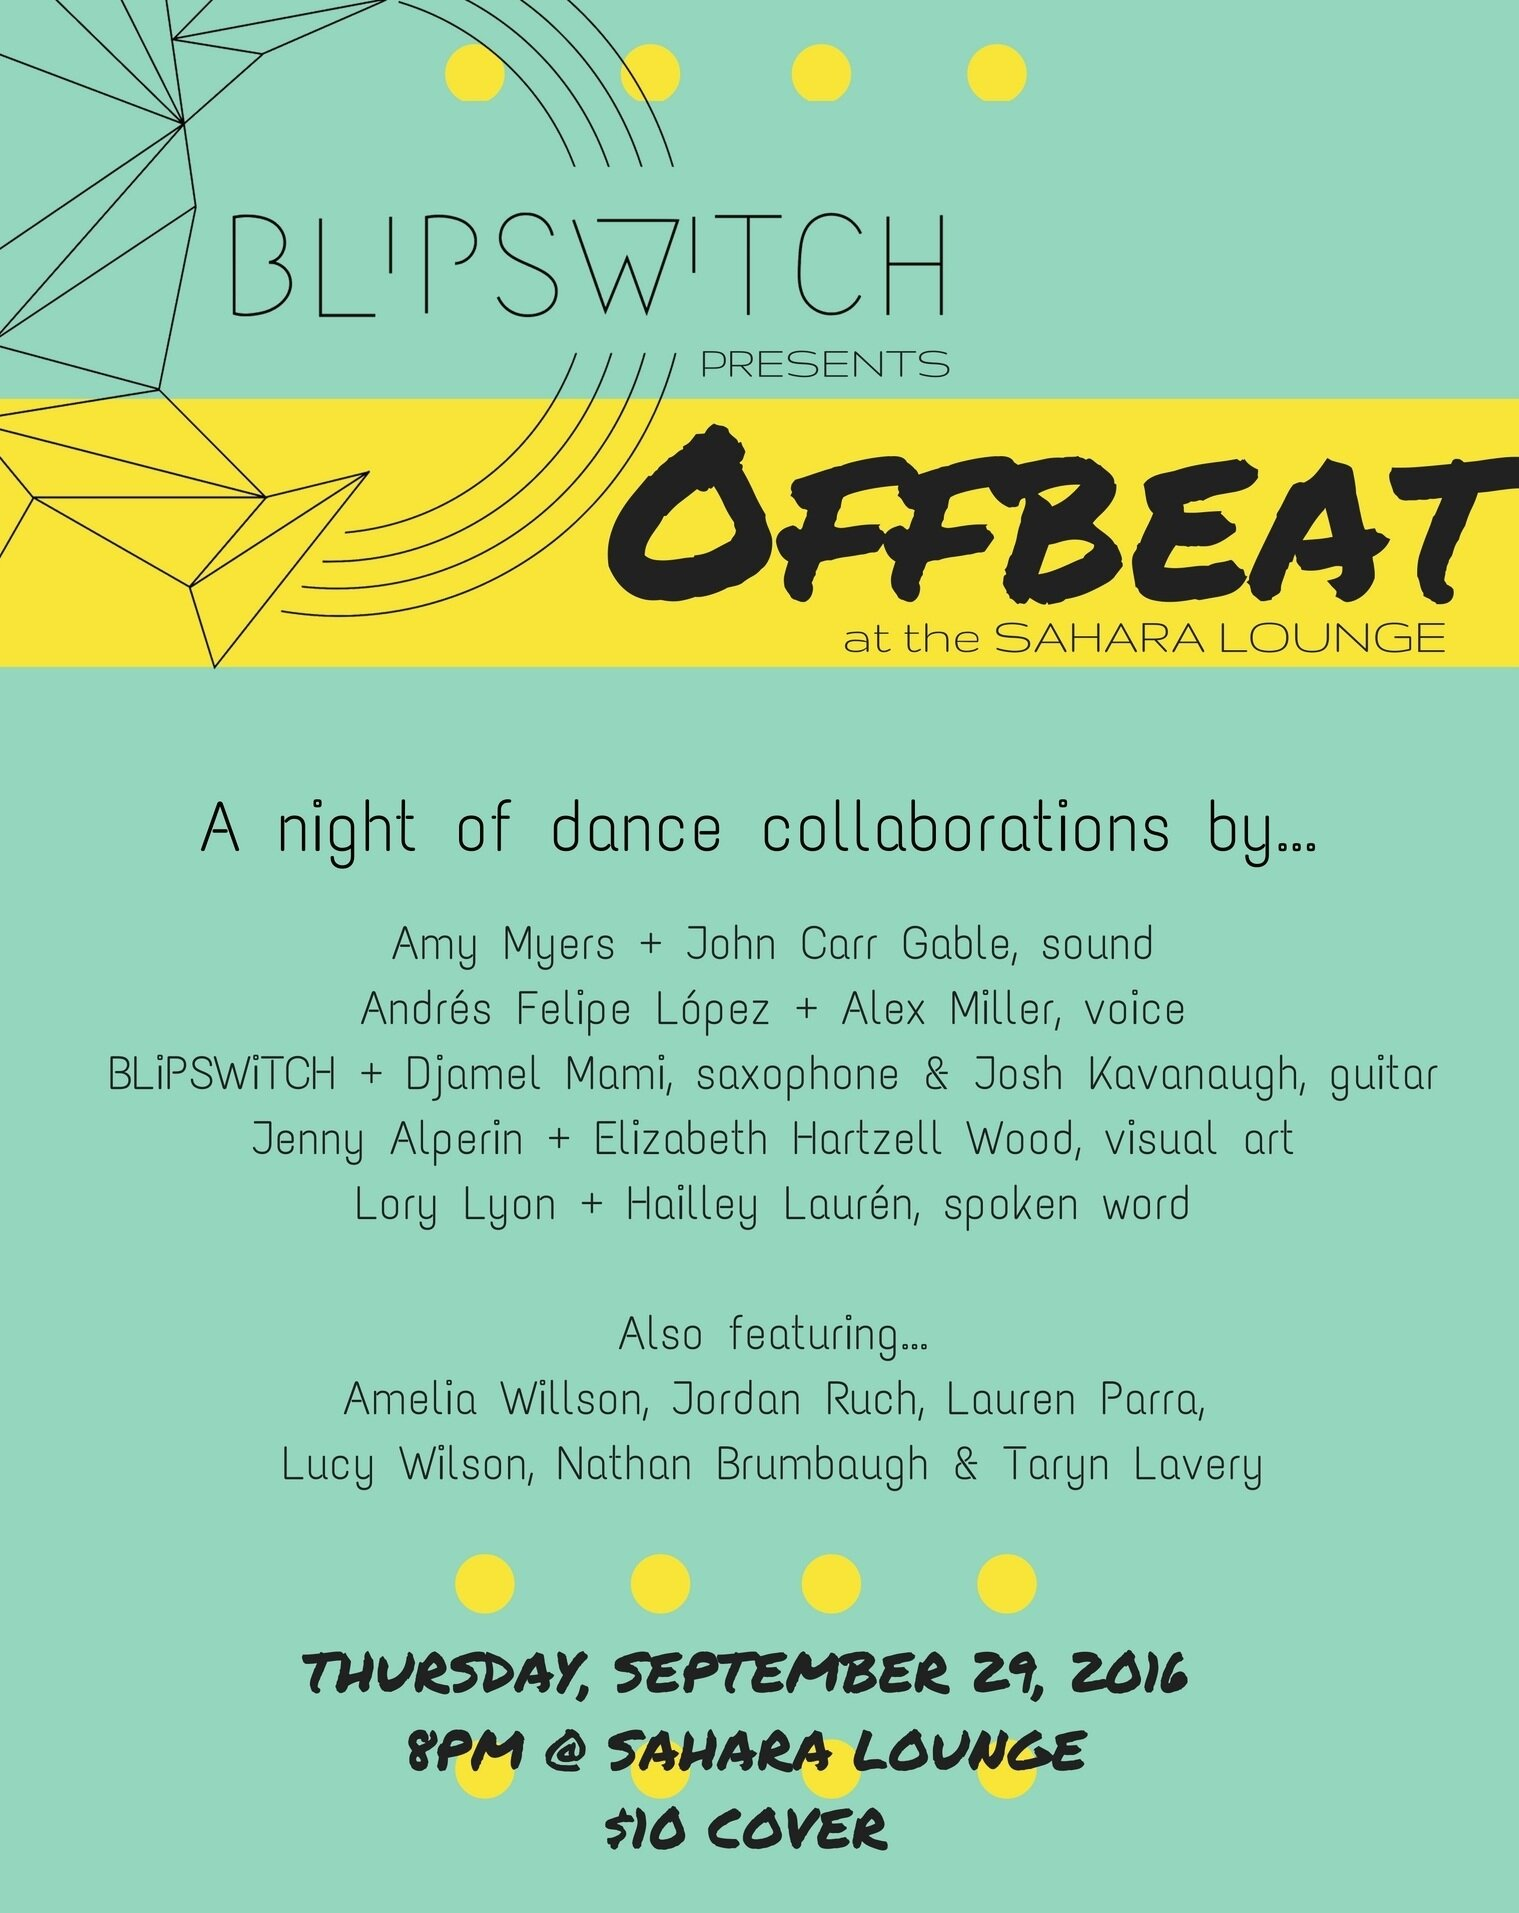 BLiPSWiTCH presents Offbeat II - September 29, 2016Sahara Lounge. Austin, TX